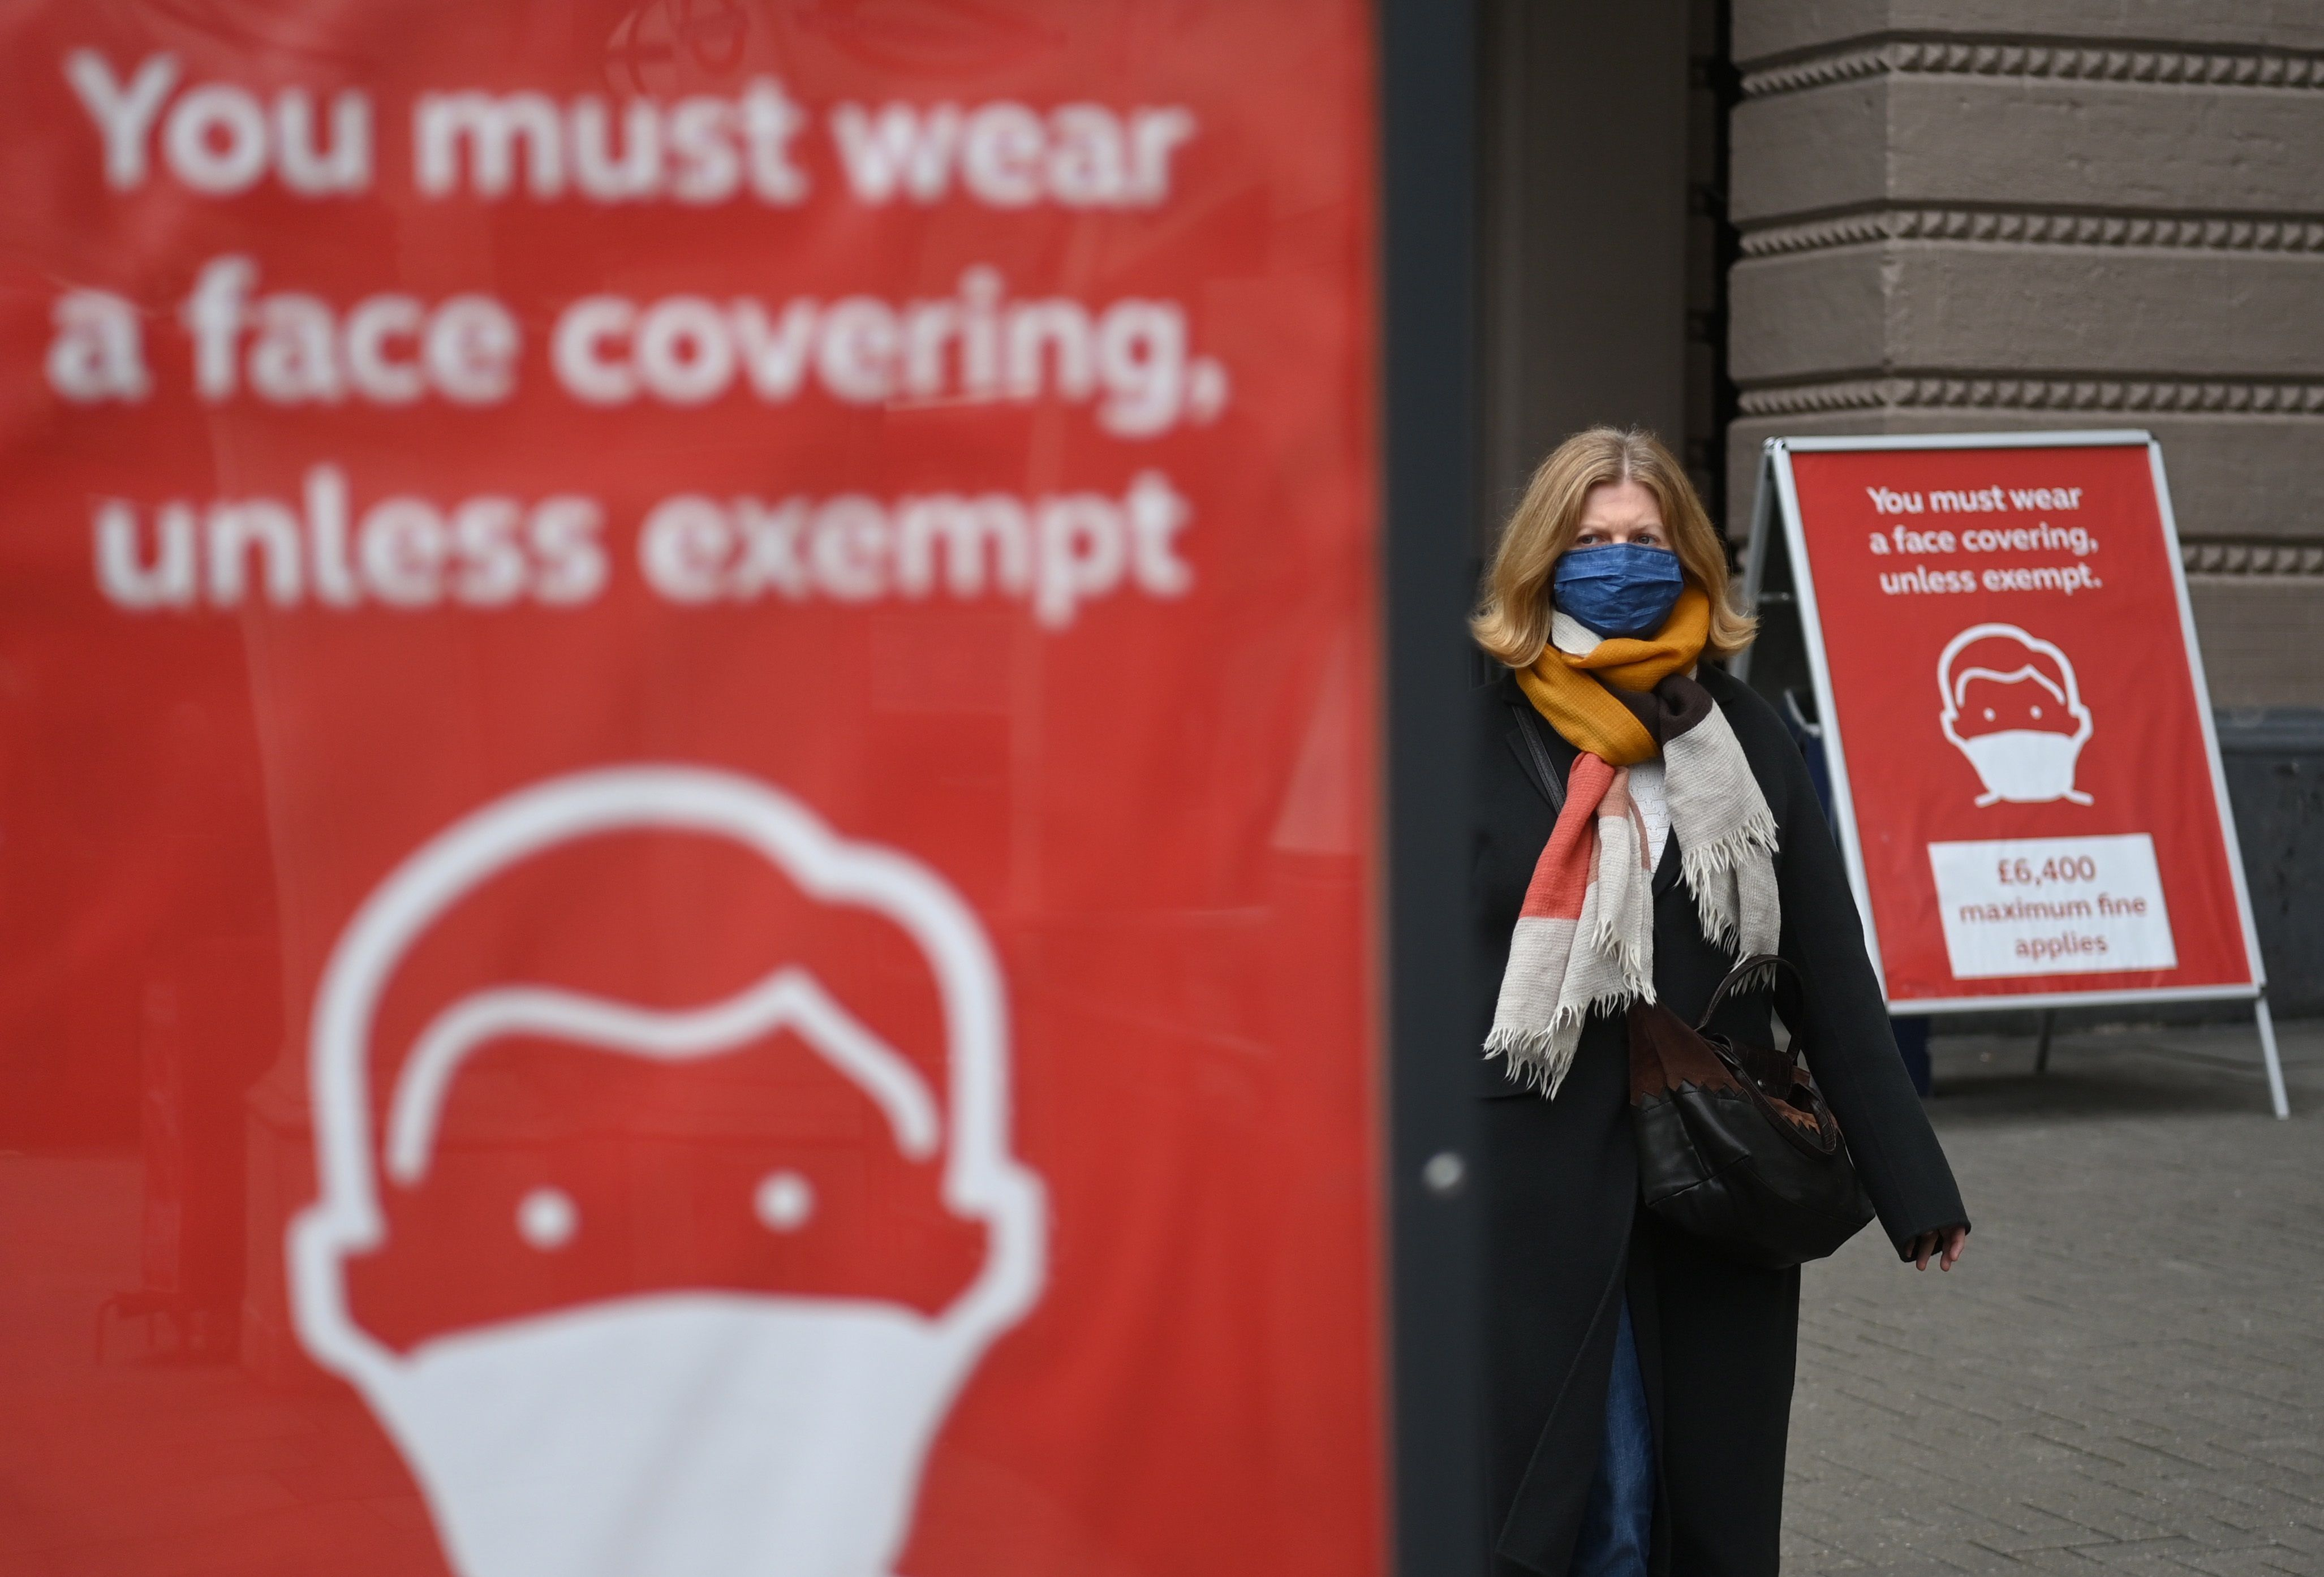 Une femme arpente les rues de Londres ce samedi.  EFE / EPA / NEIL HALL